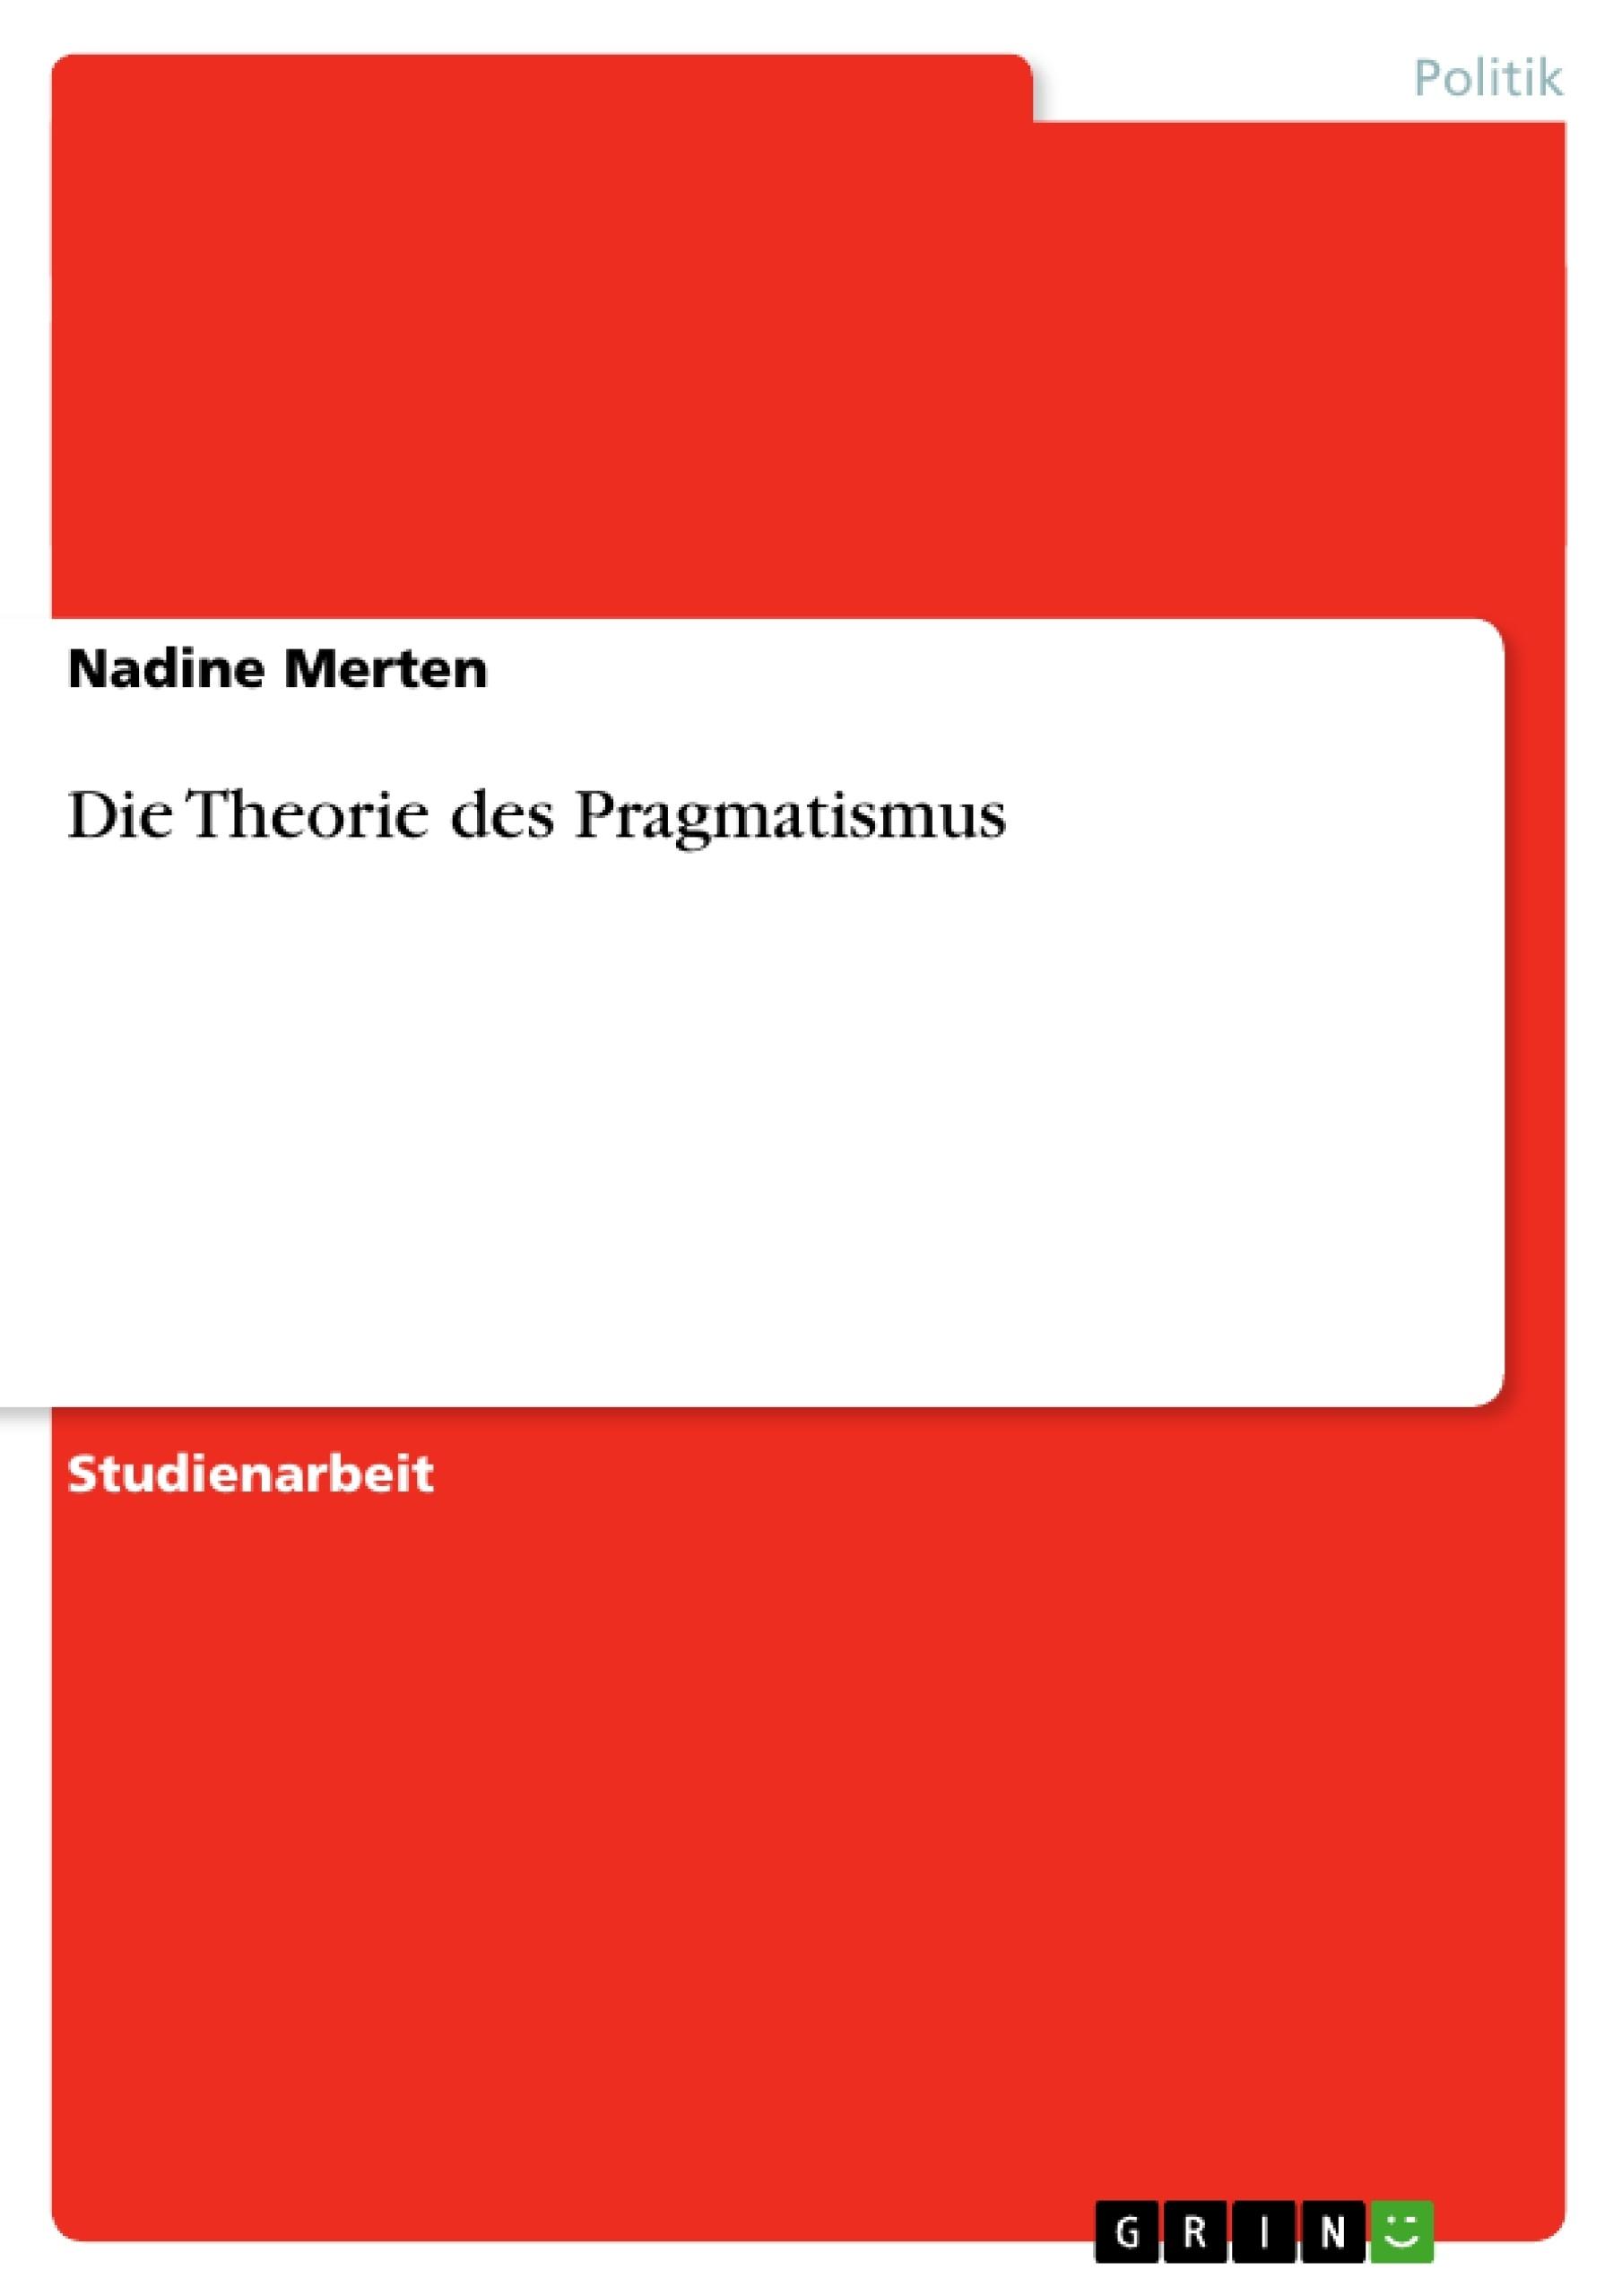 Titel: Die Theorie des Pragmatismus